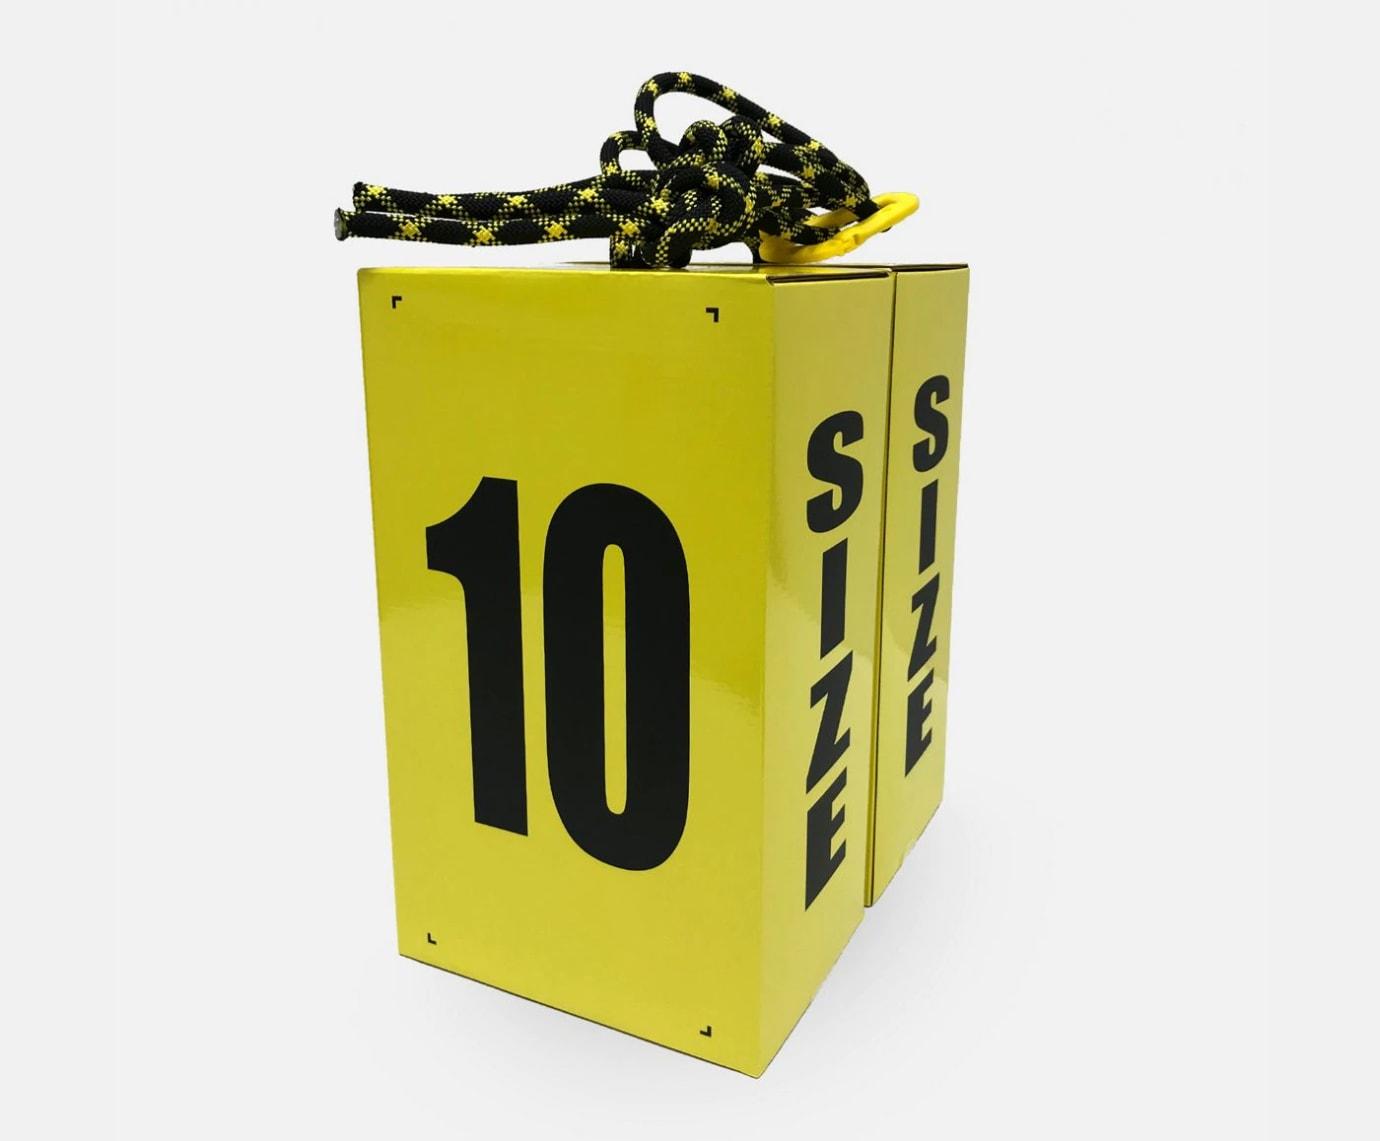 ASAP Rocky x Under Armour SRLo (Box)